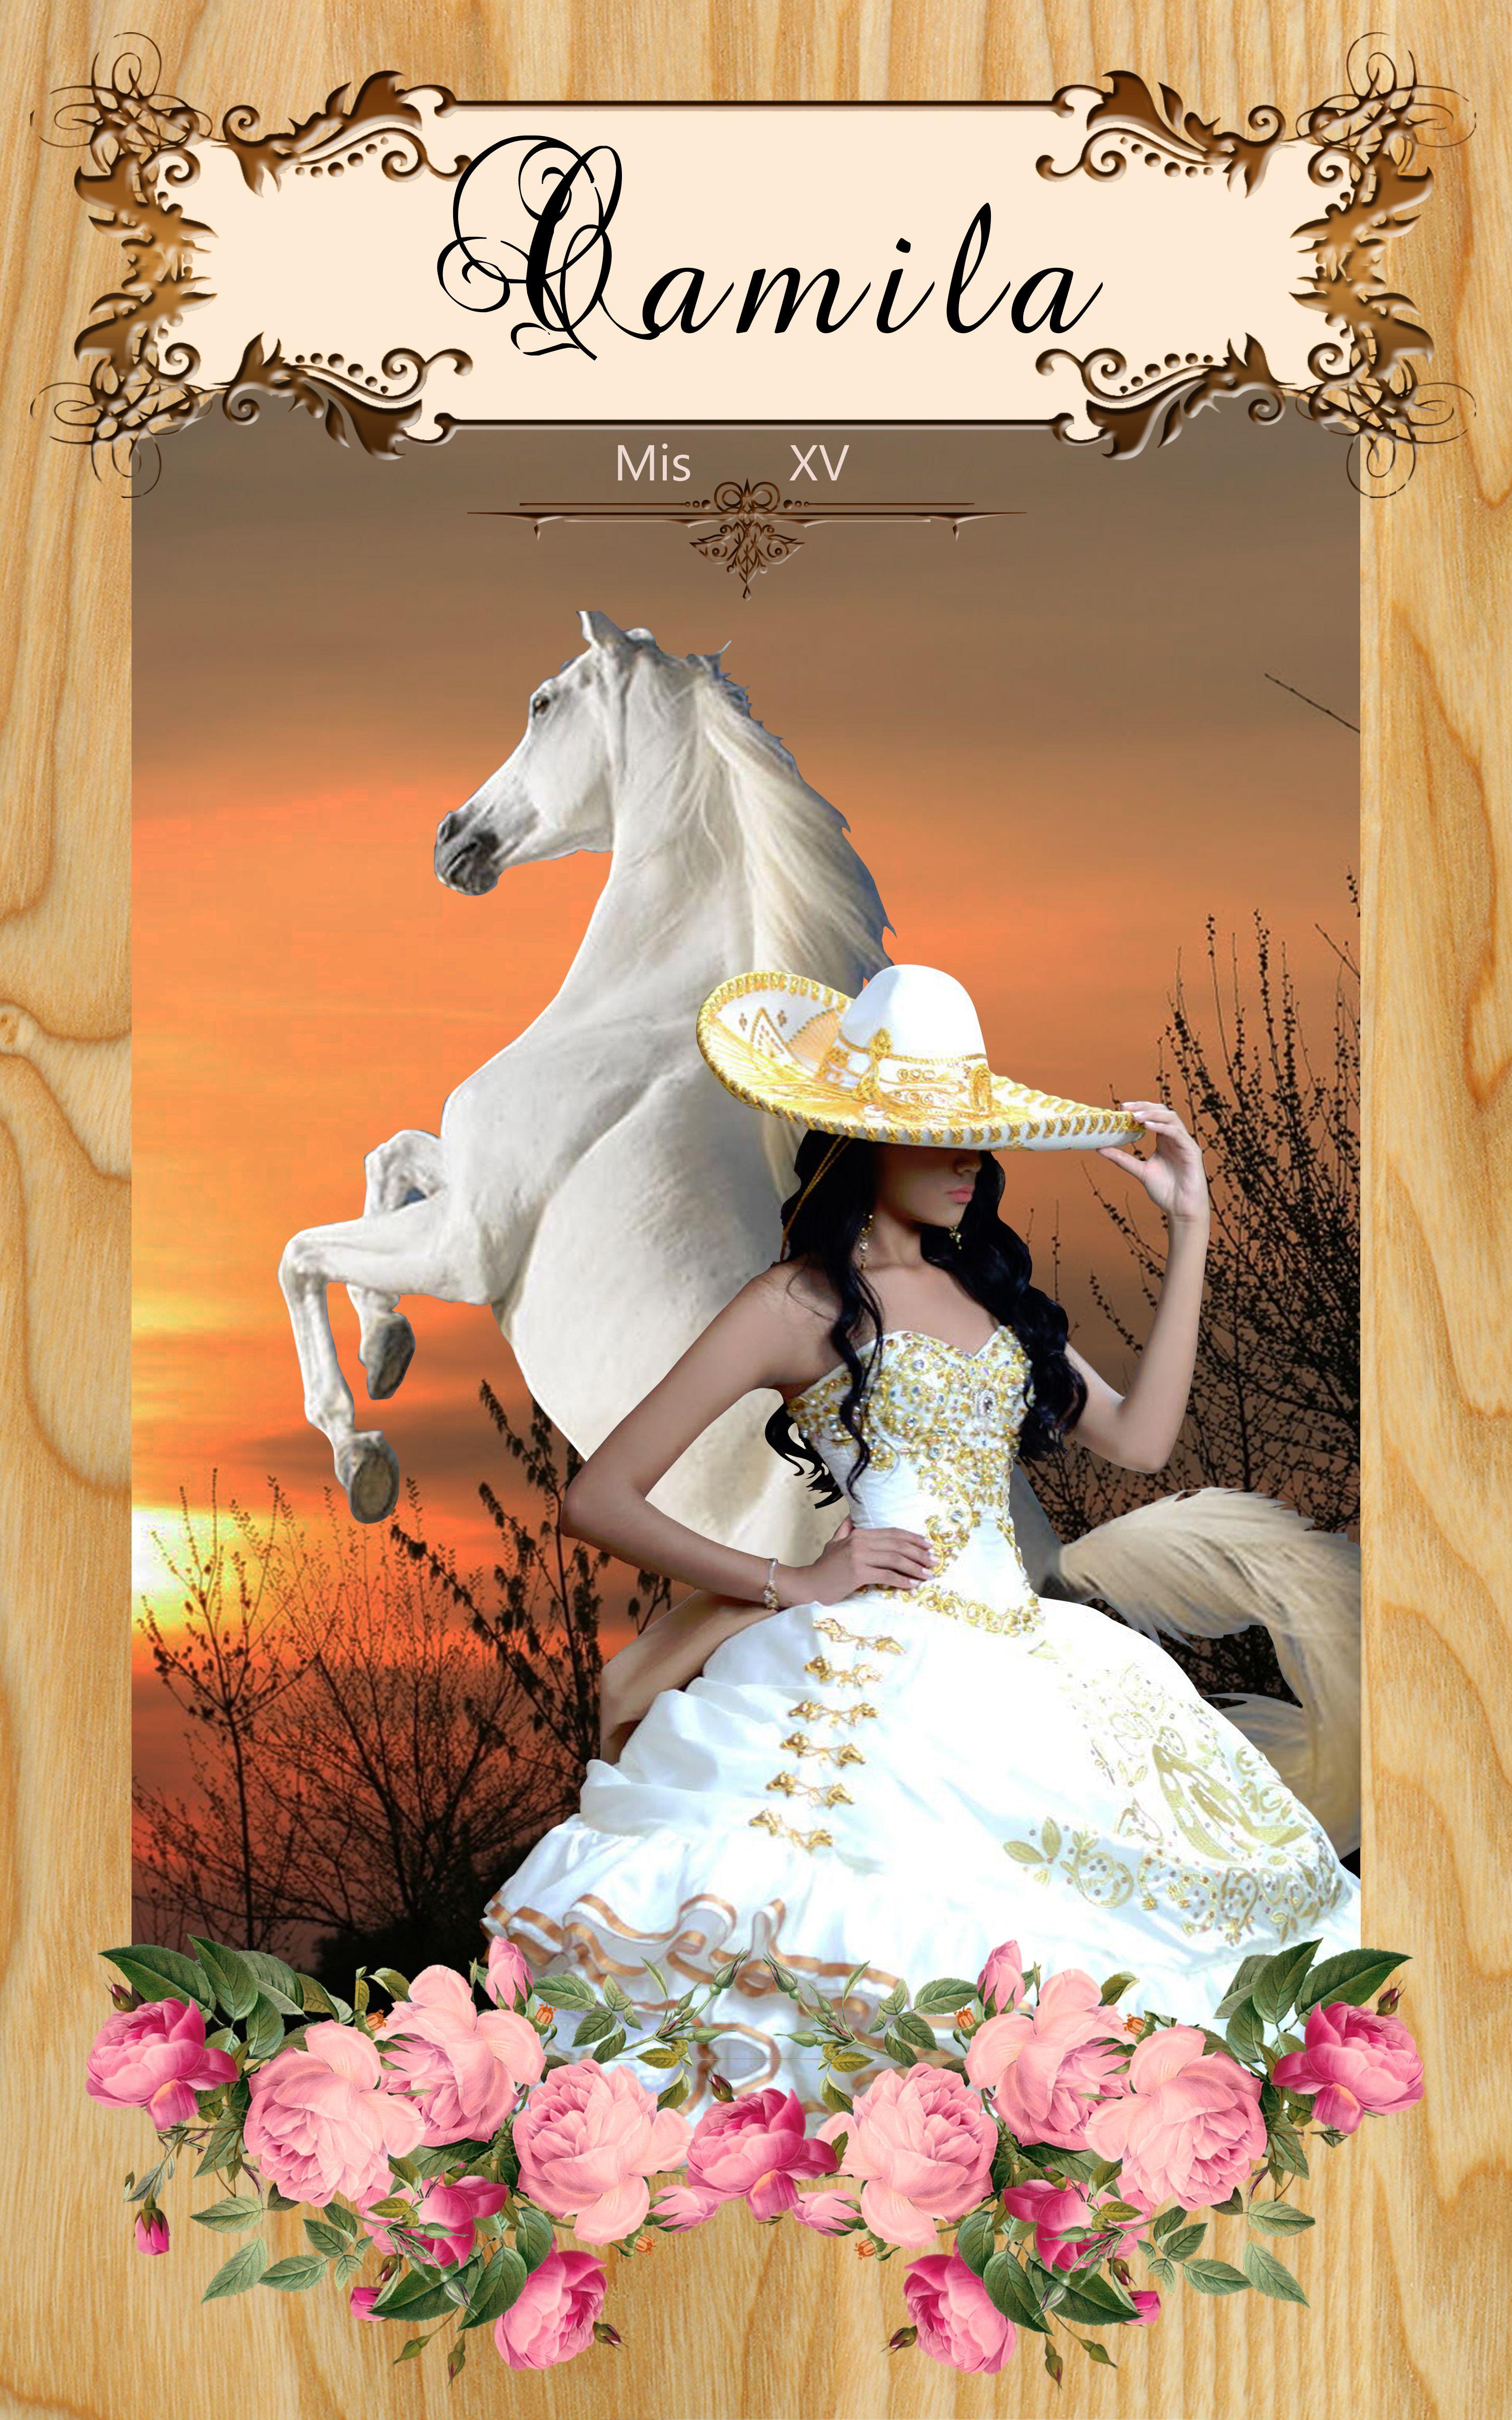 Charra Quinceanera Inviations Xv Años Creative Designs For